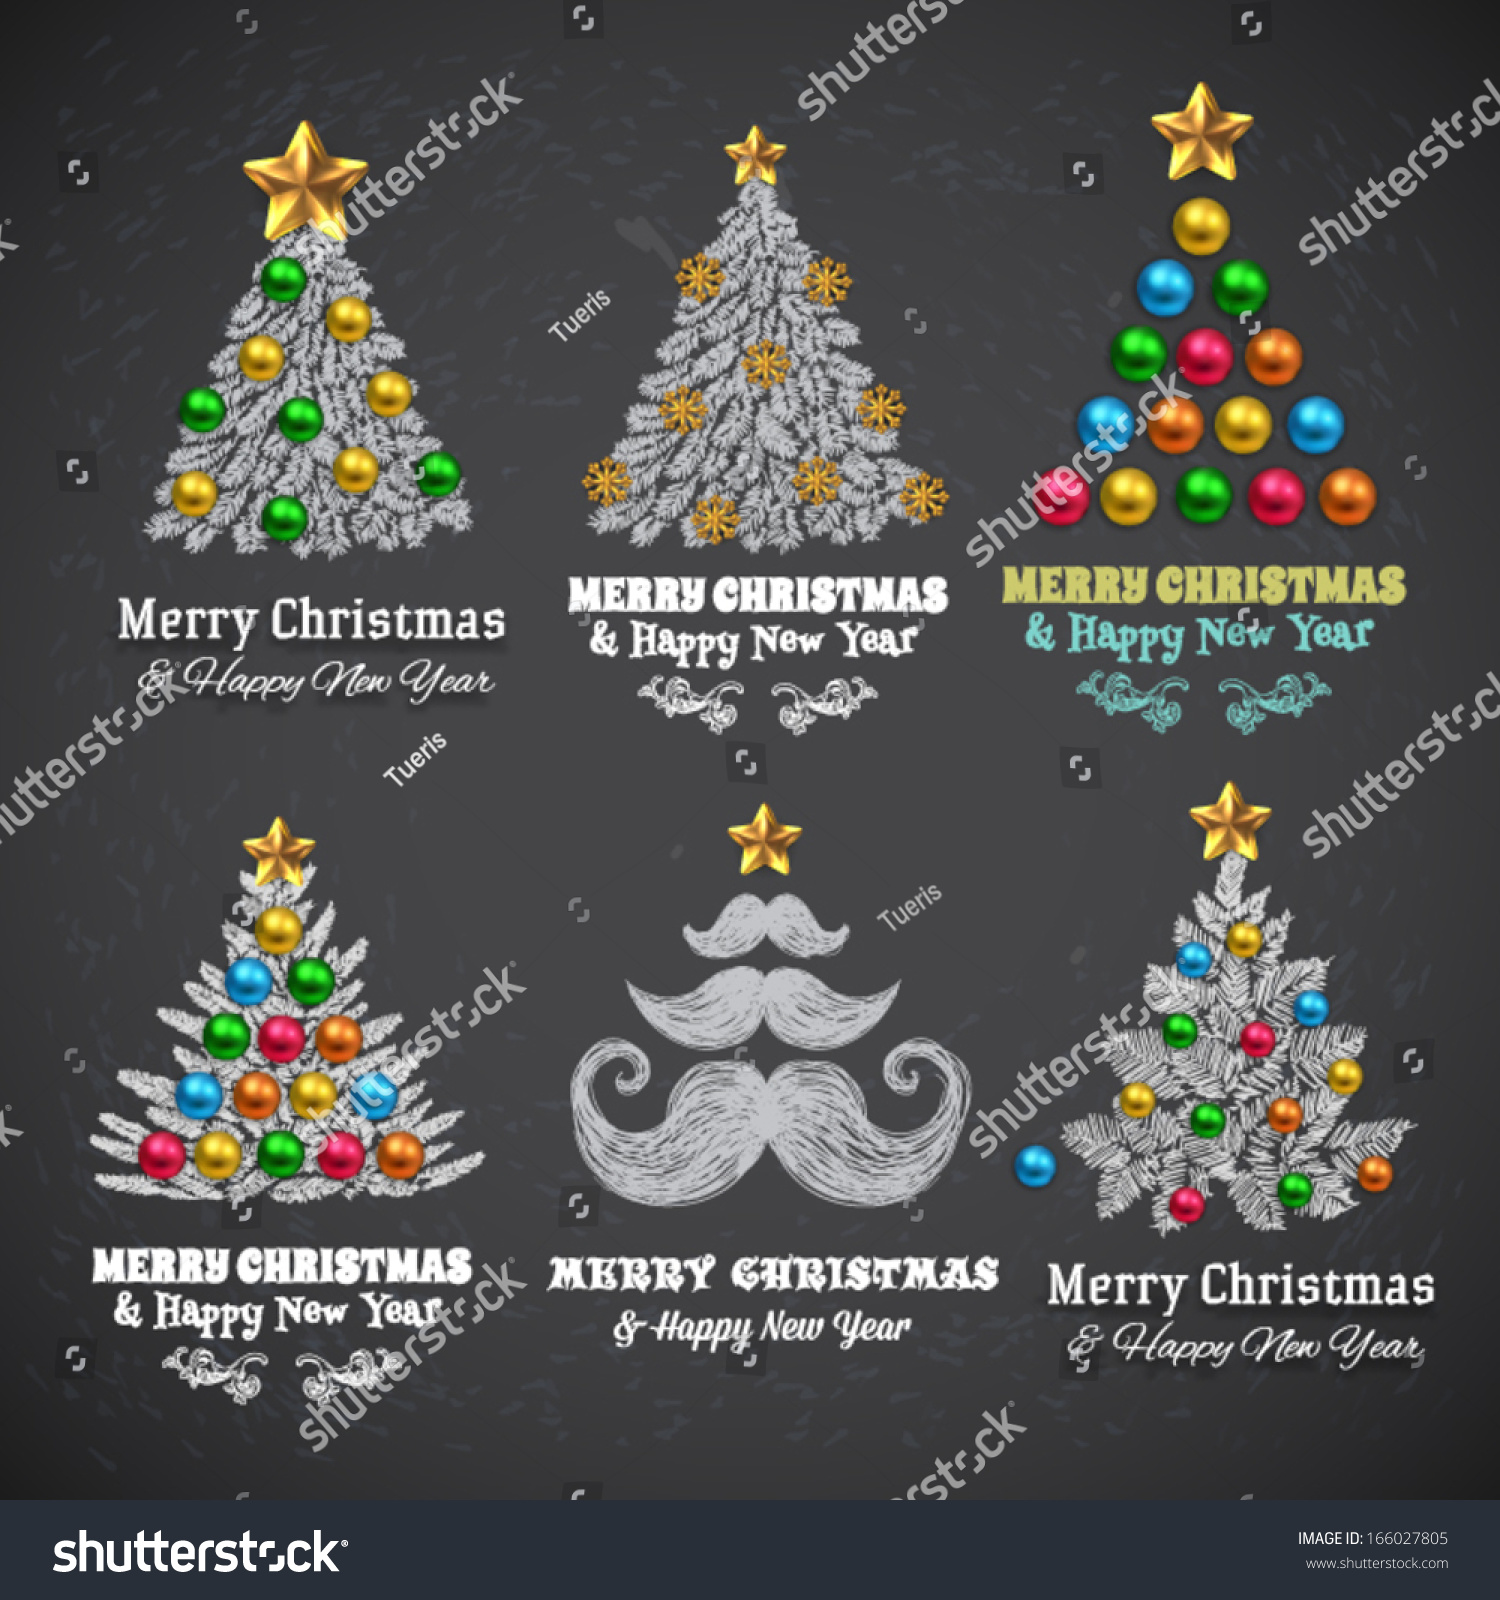 Christmas Tree Balls Gifts Vector Design Stock Vector Royalty Free